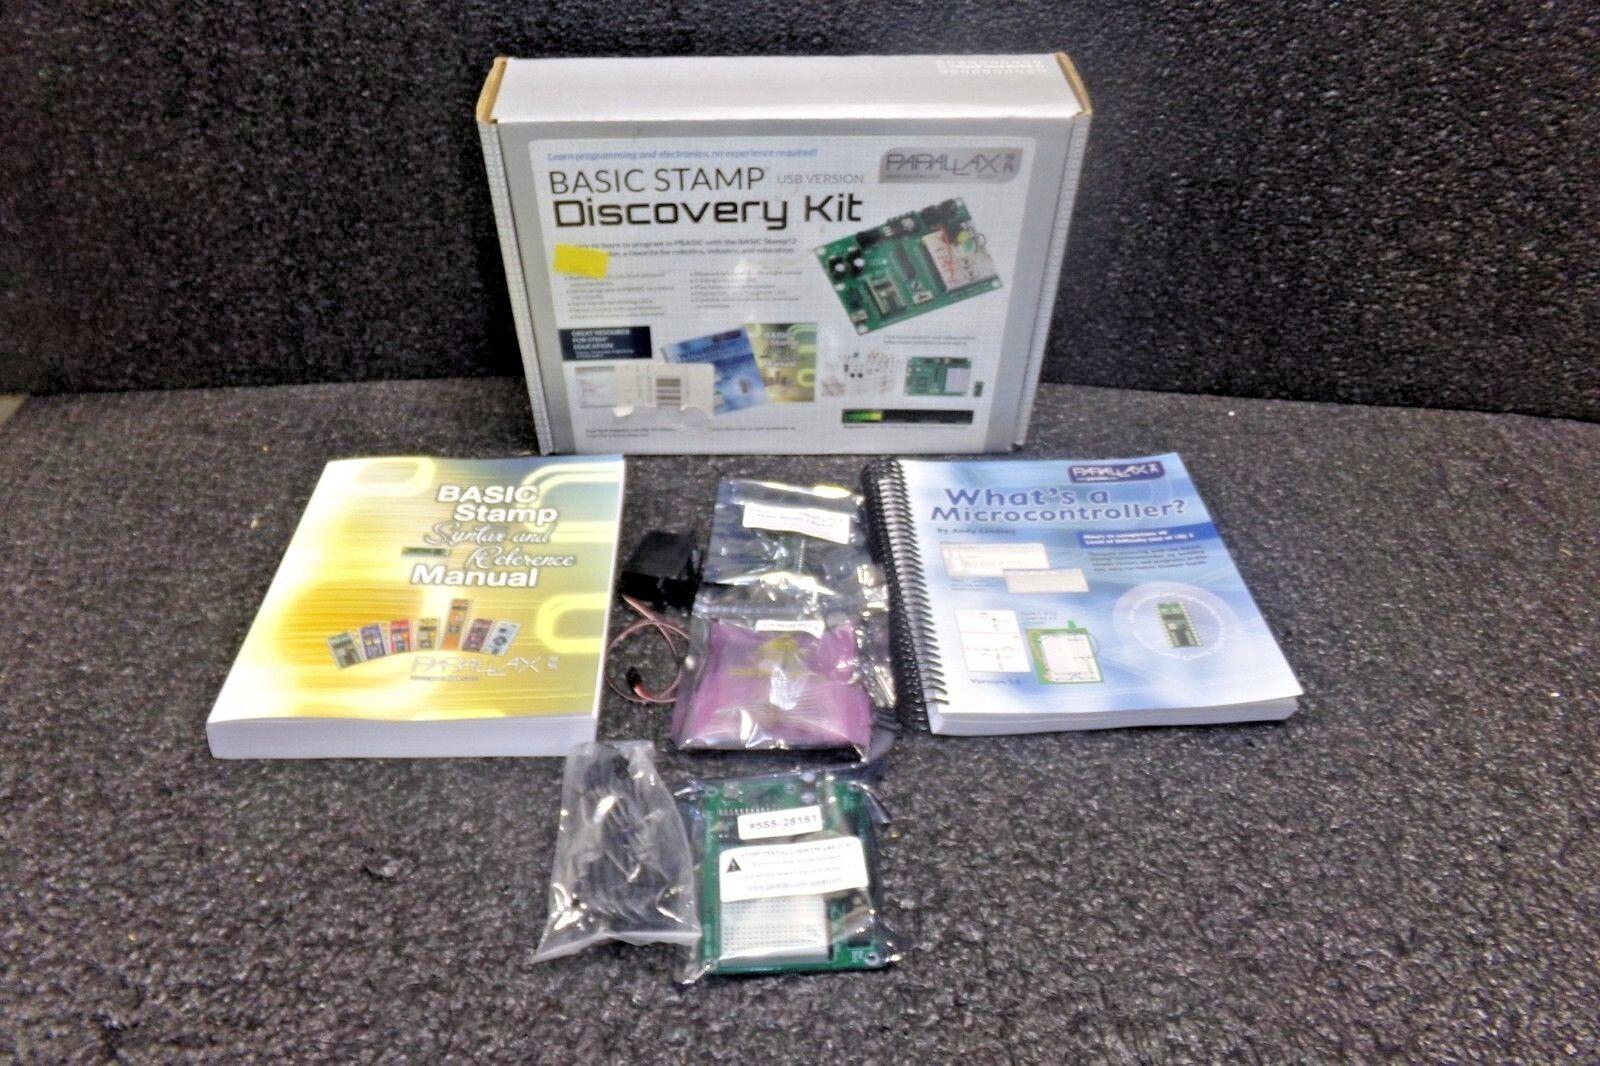 Kit de descubrimiento de sello de paralaje 27807 Basic (soldado de juguete)